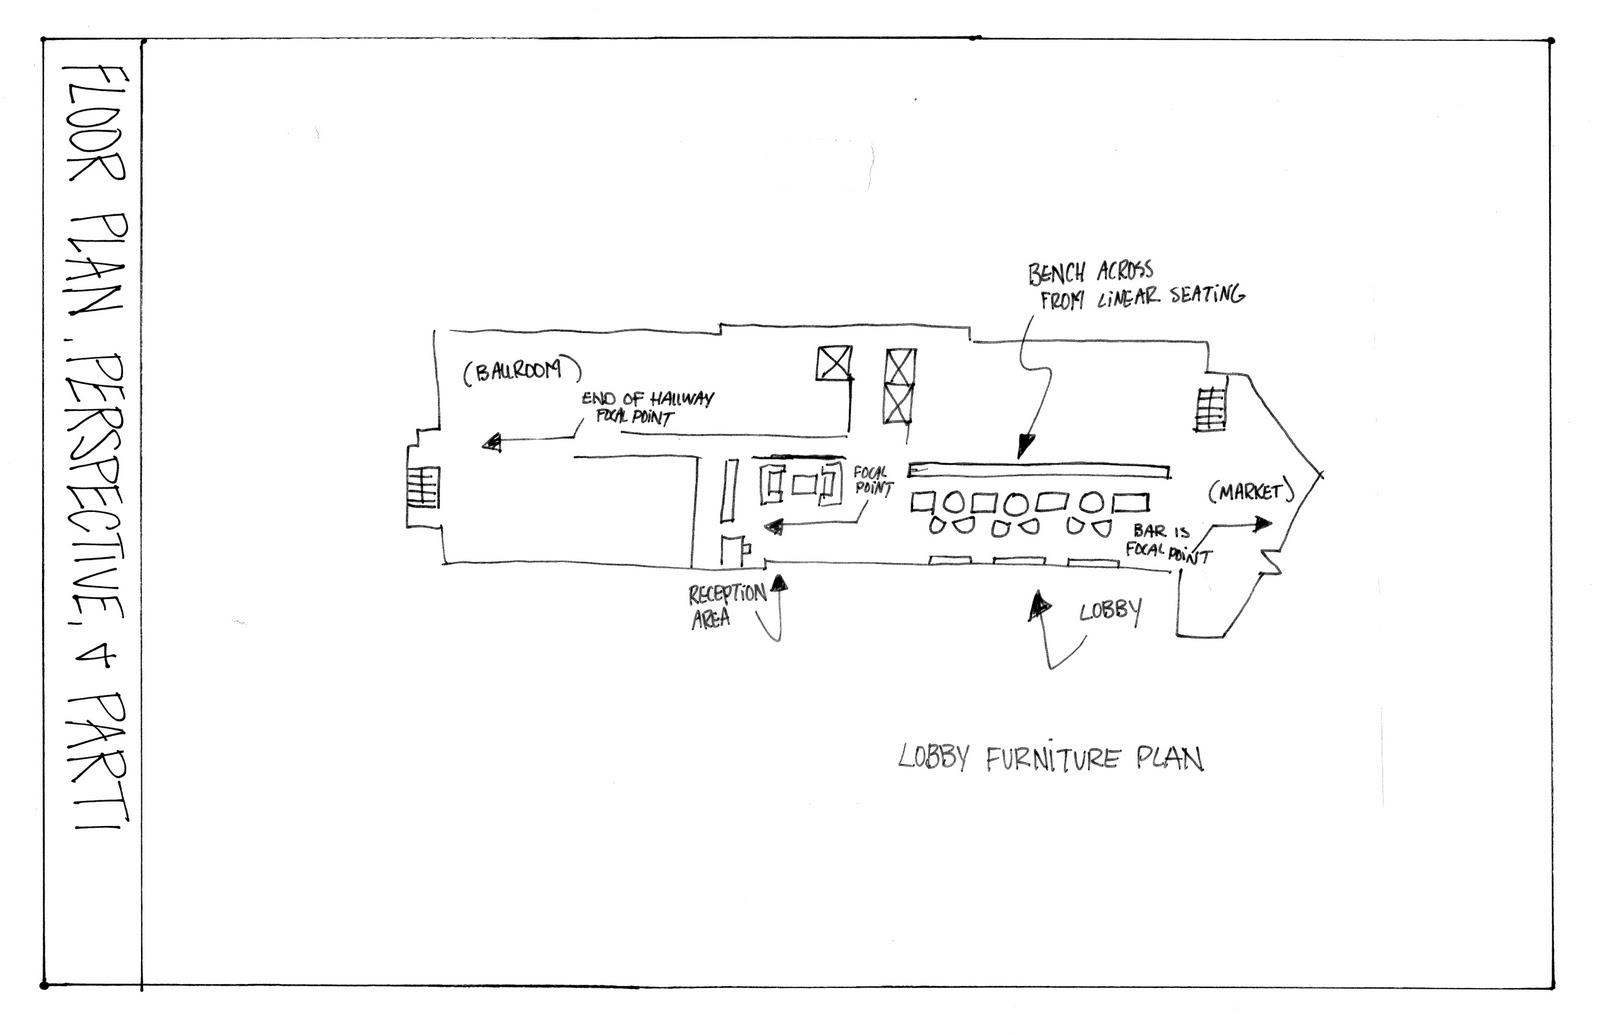 Hotel lobby furniture plan - Lobby Furniture Plan